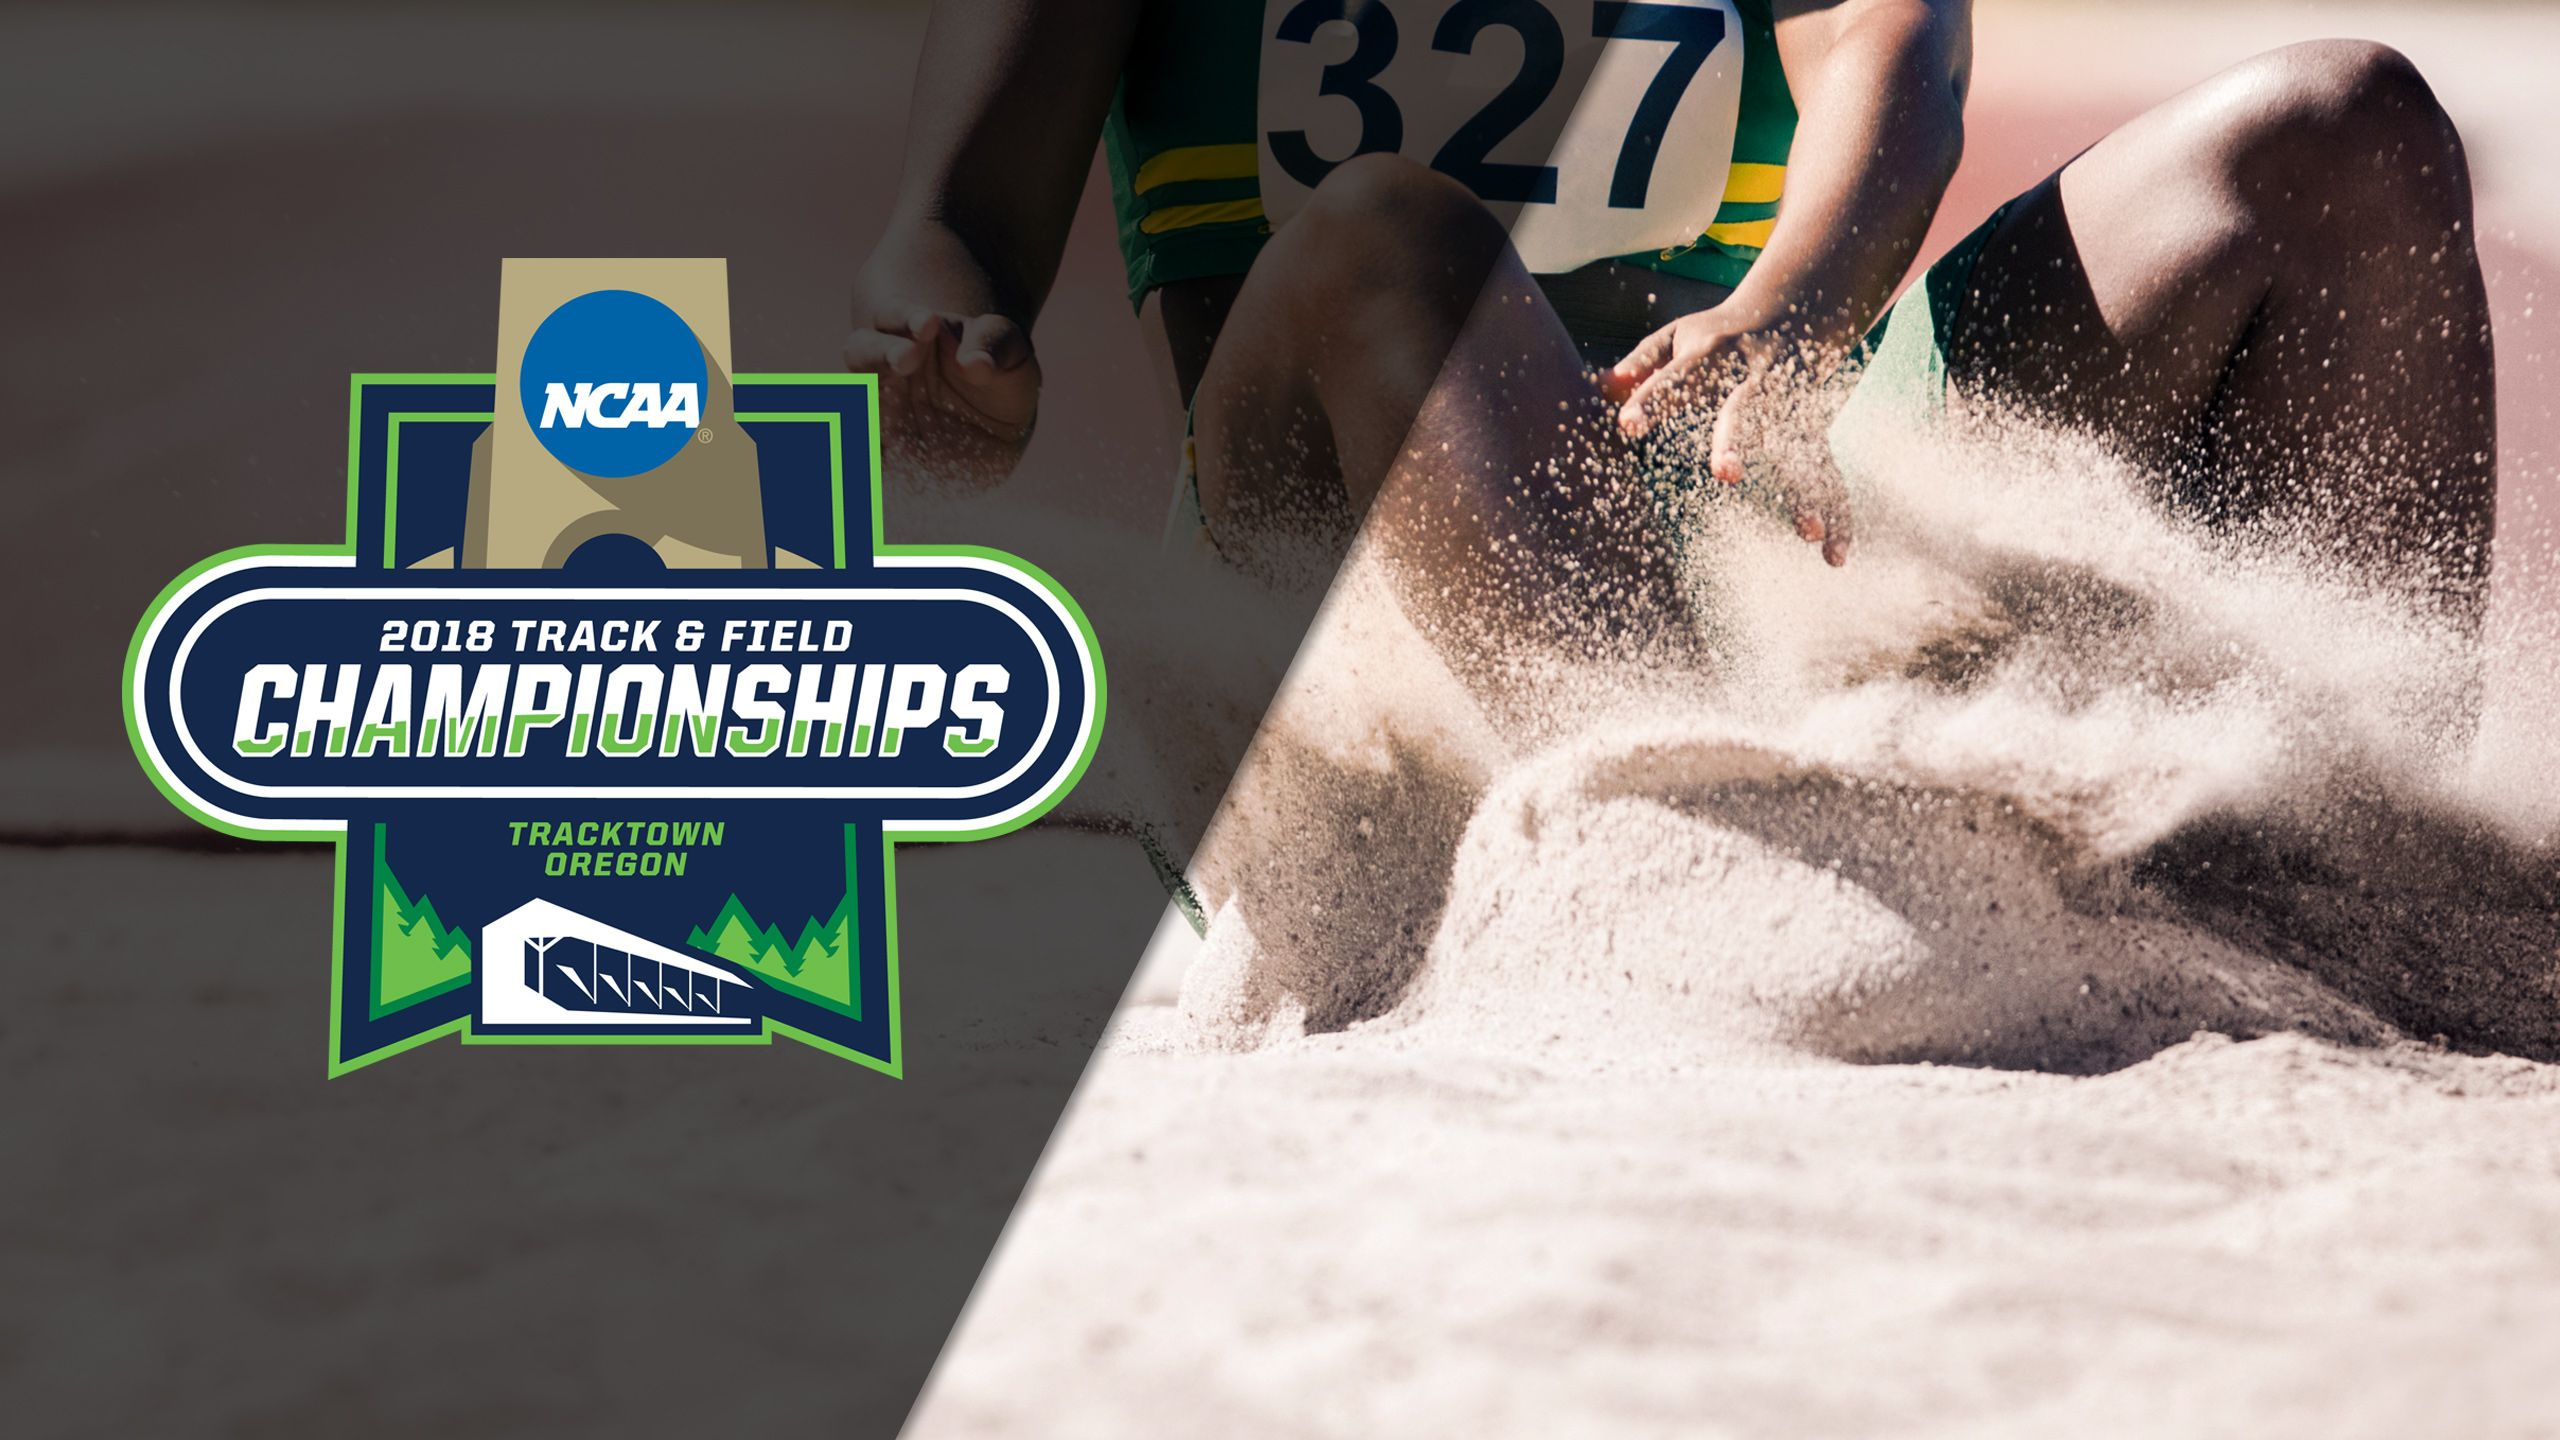 NCAA Track & Field Outdoor Championships - Men's Triple Jump Trials (Flight 2) & Final (Feed #3)